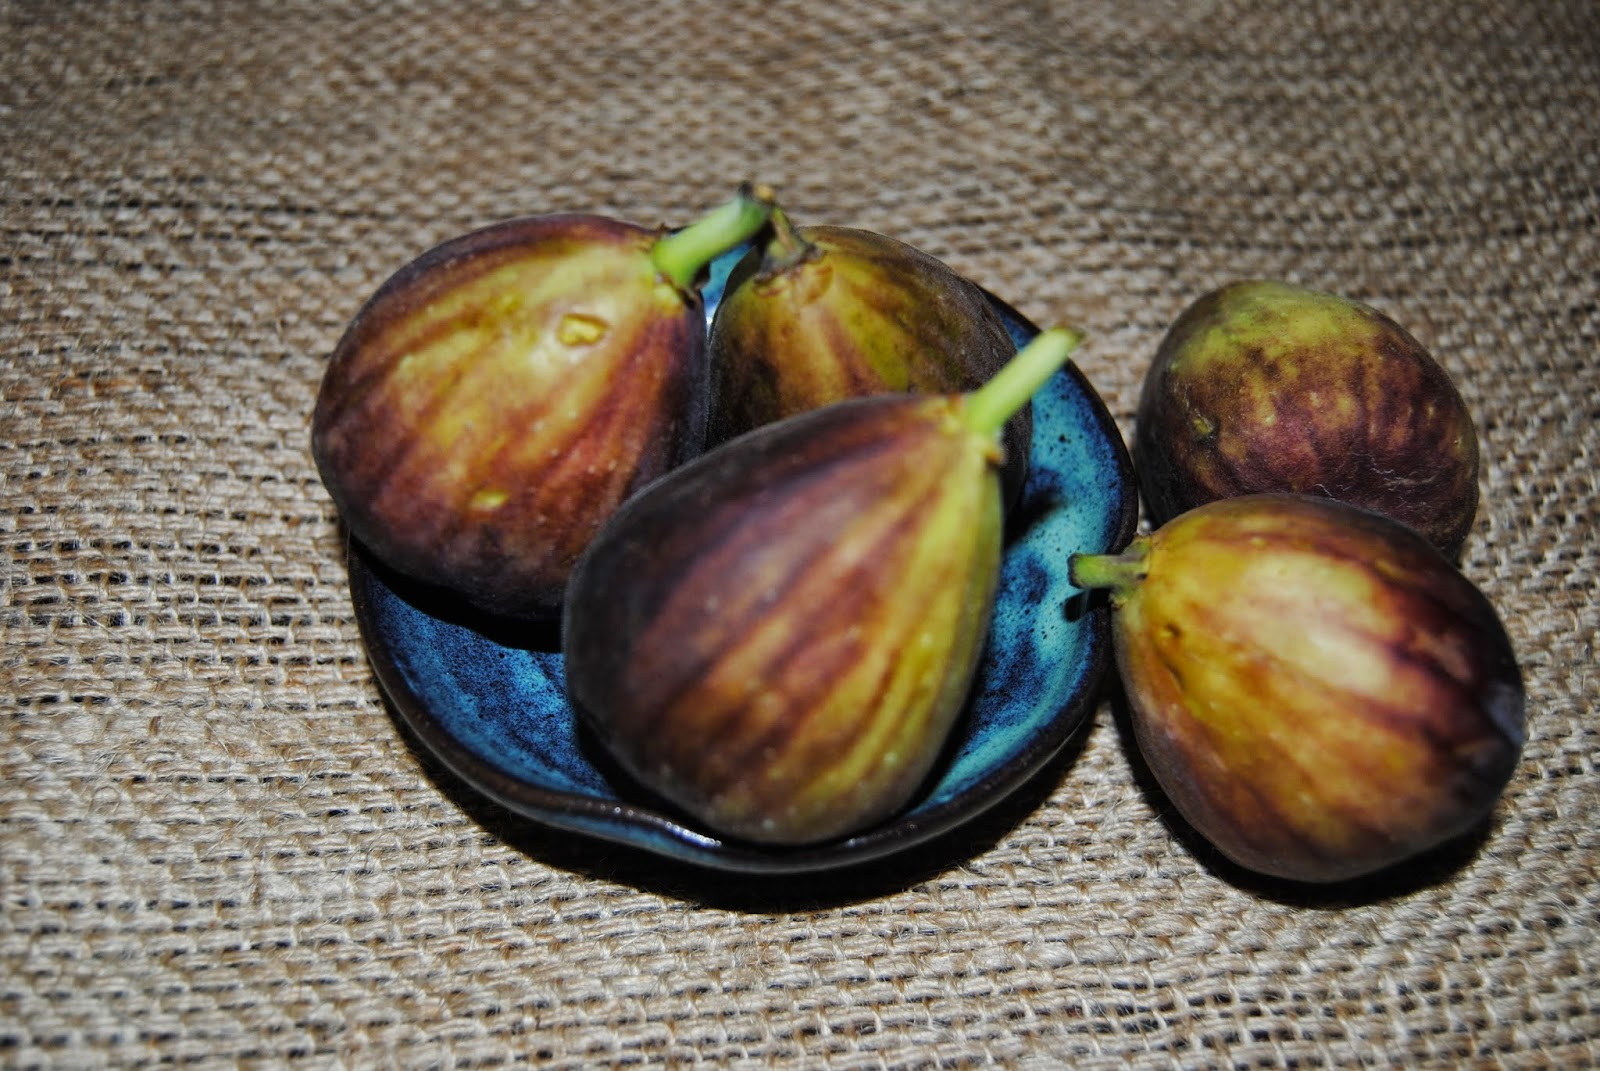 delicious salad of roast duck+figs